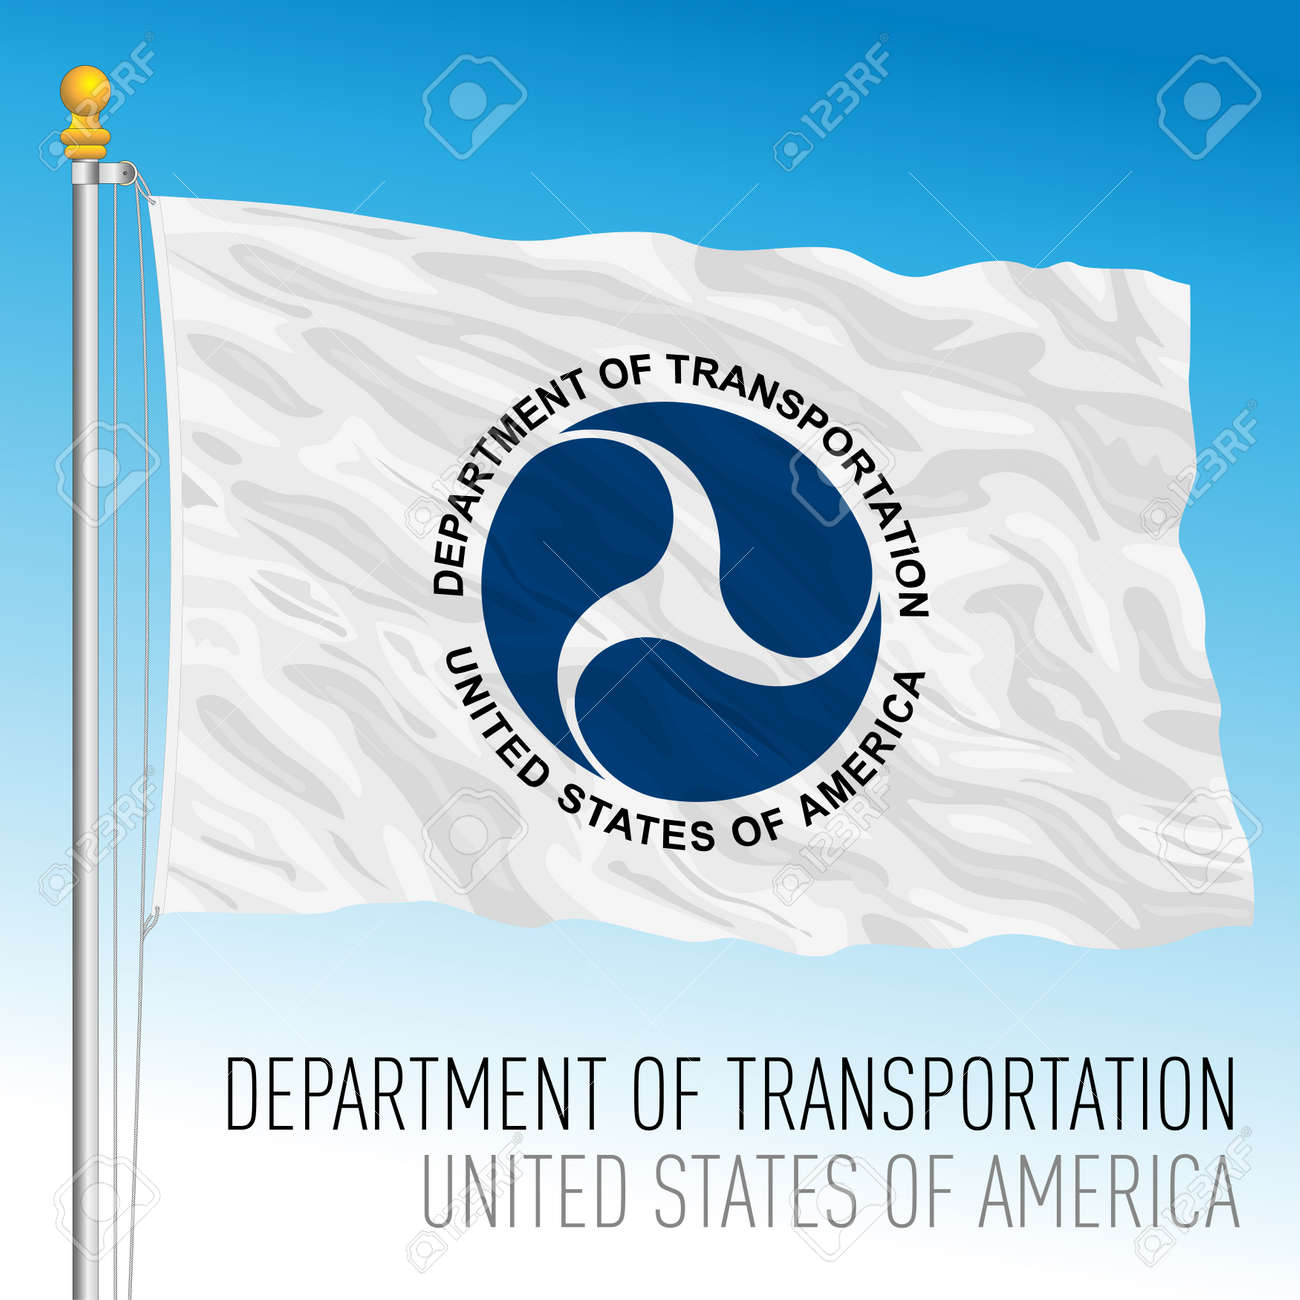 US Department of Transportation flag, United States of America, vector illustration - 172957374